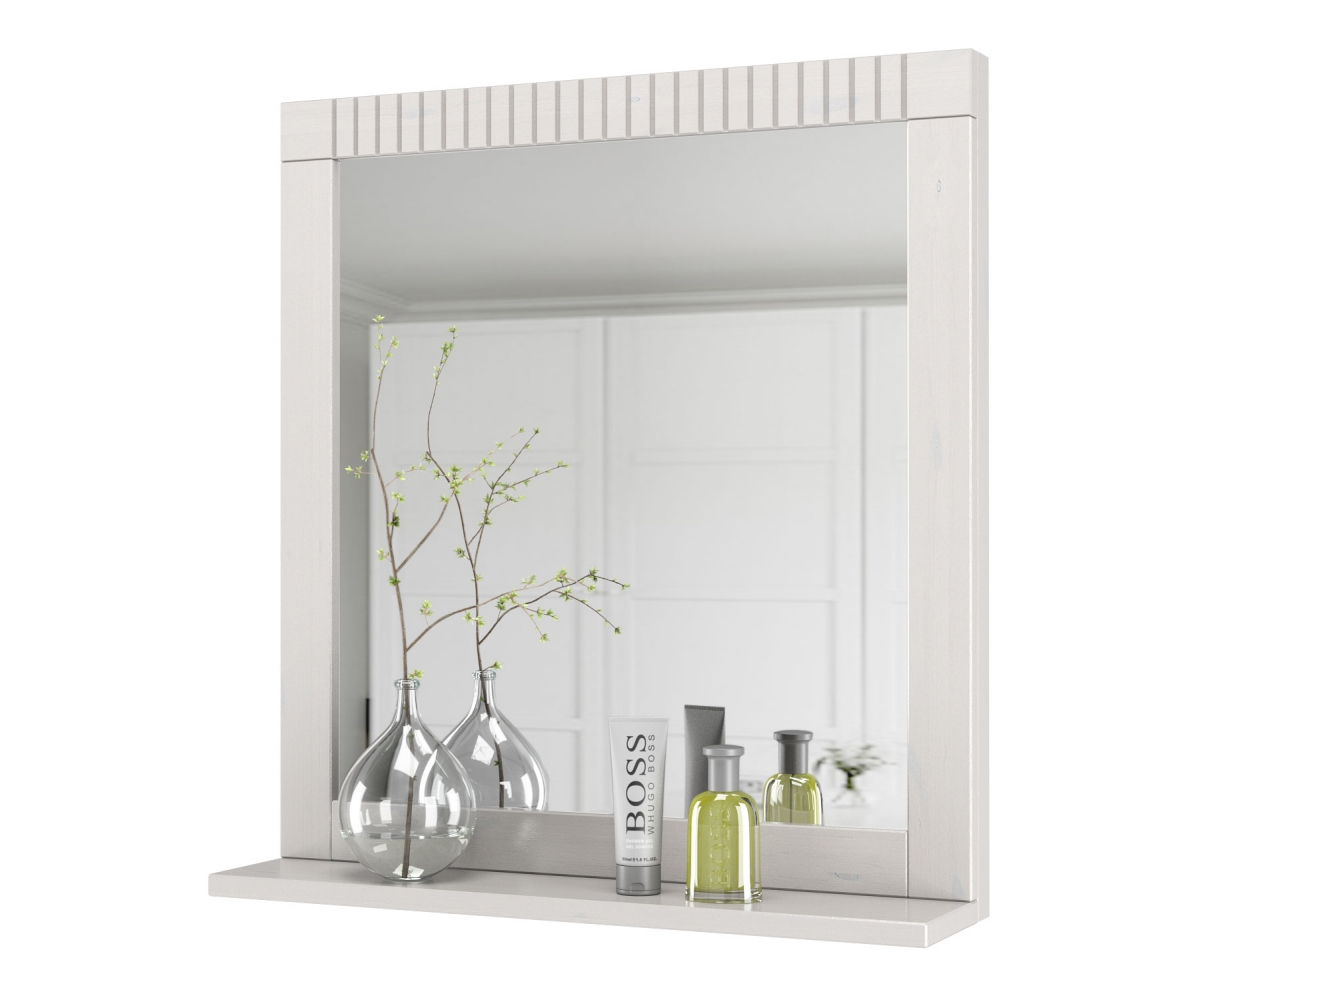 Nástěnné zrcadlo Rocia, 65 cm, bílá